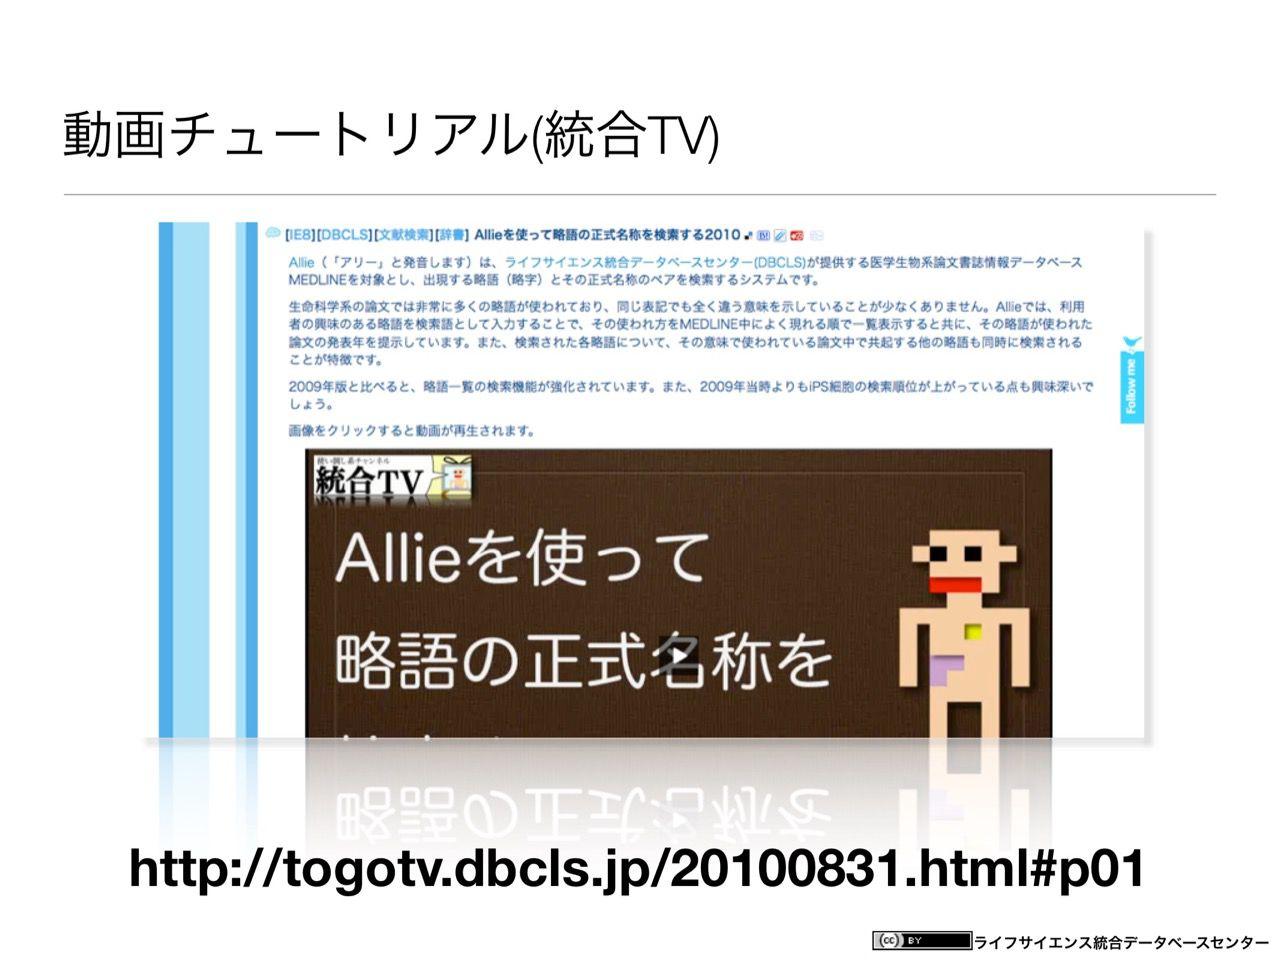 images/AJACS60_yamamoto_044.jpg